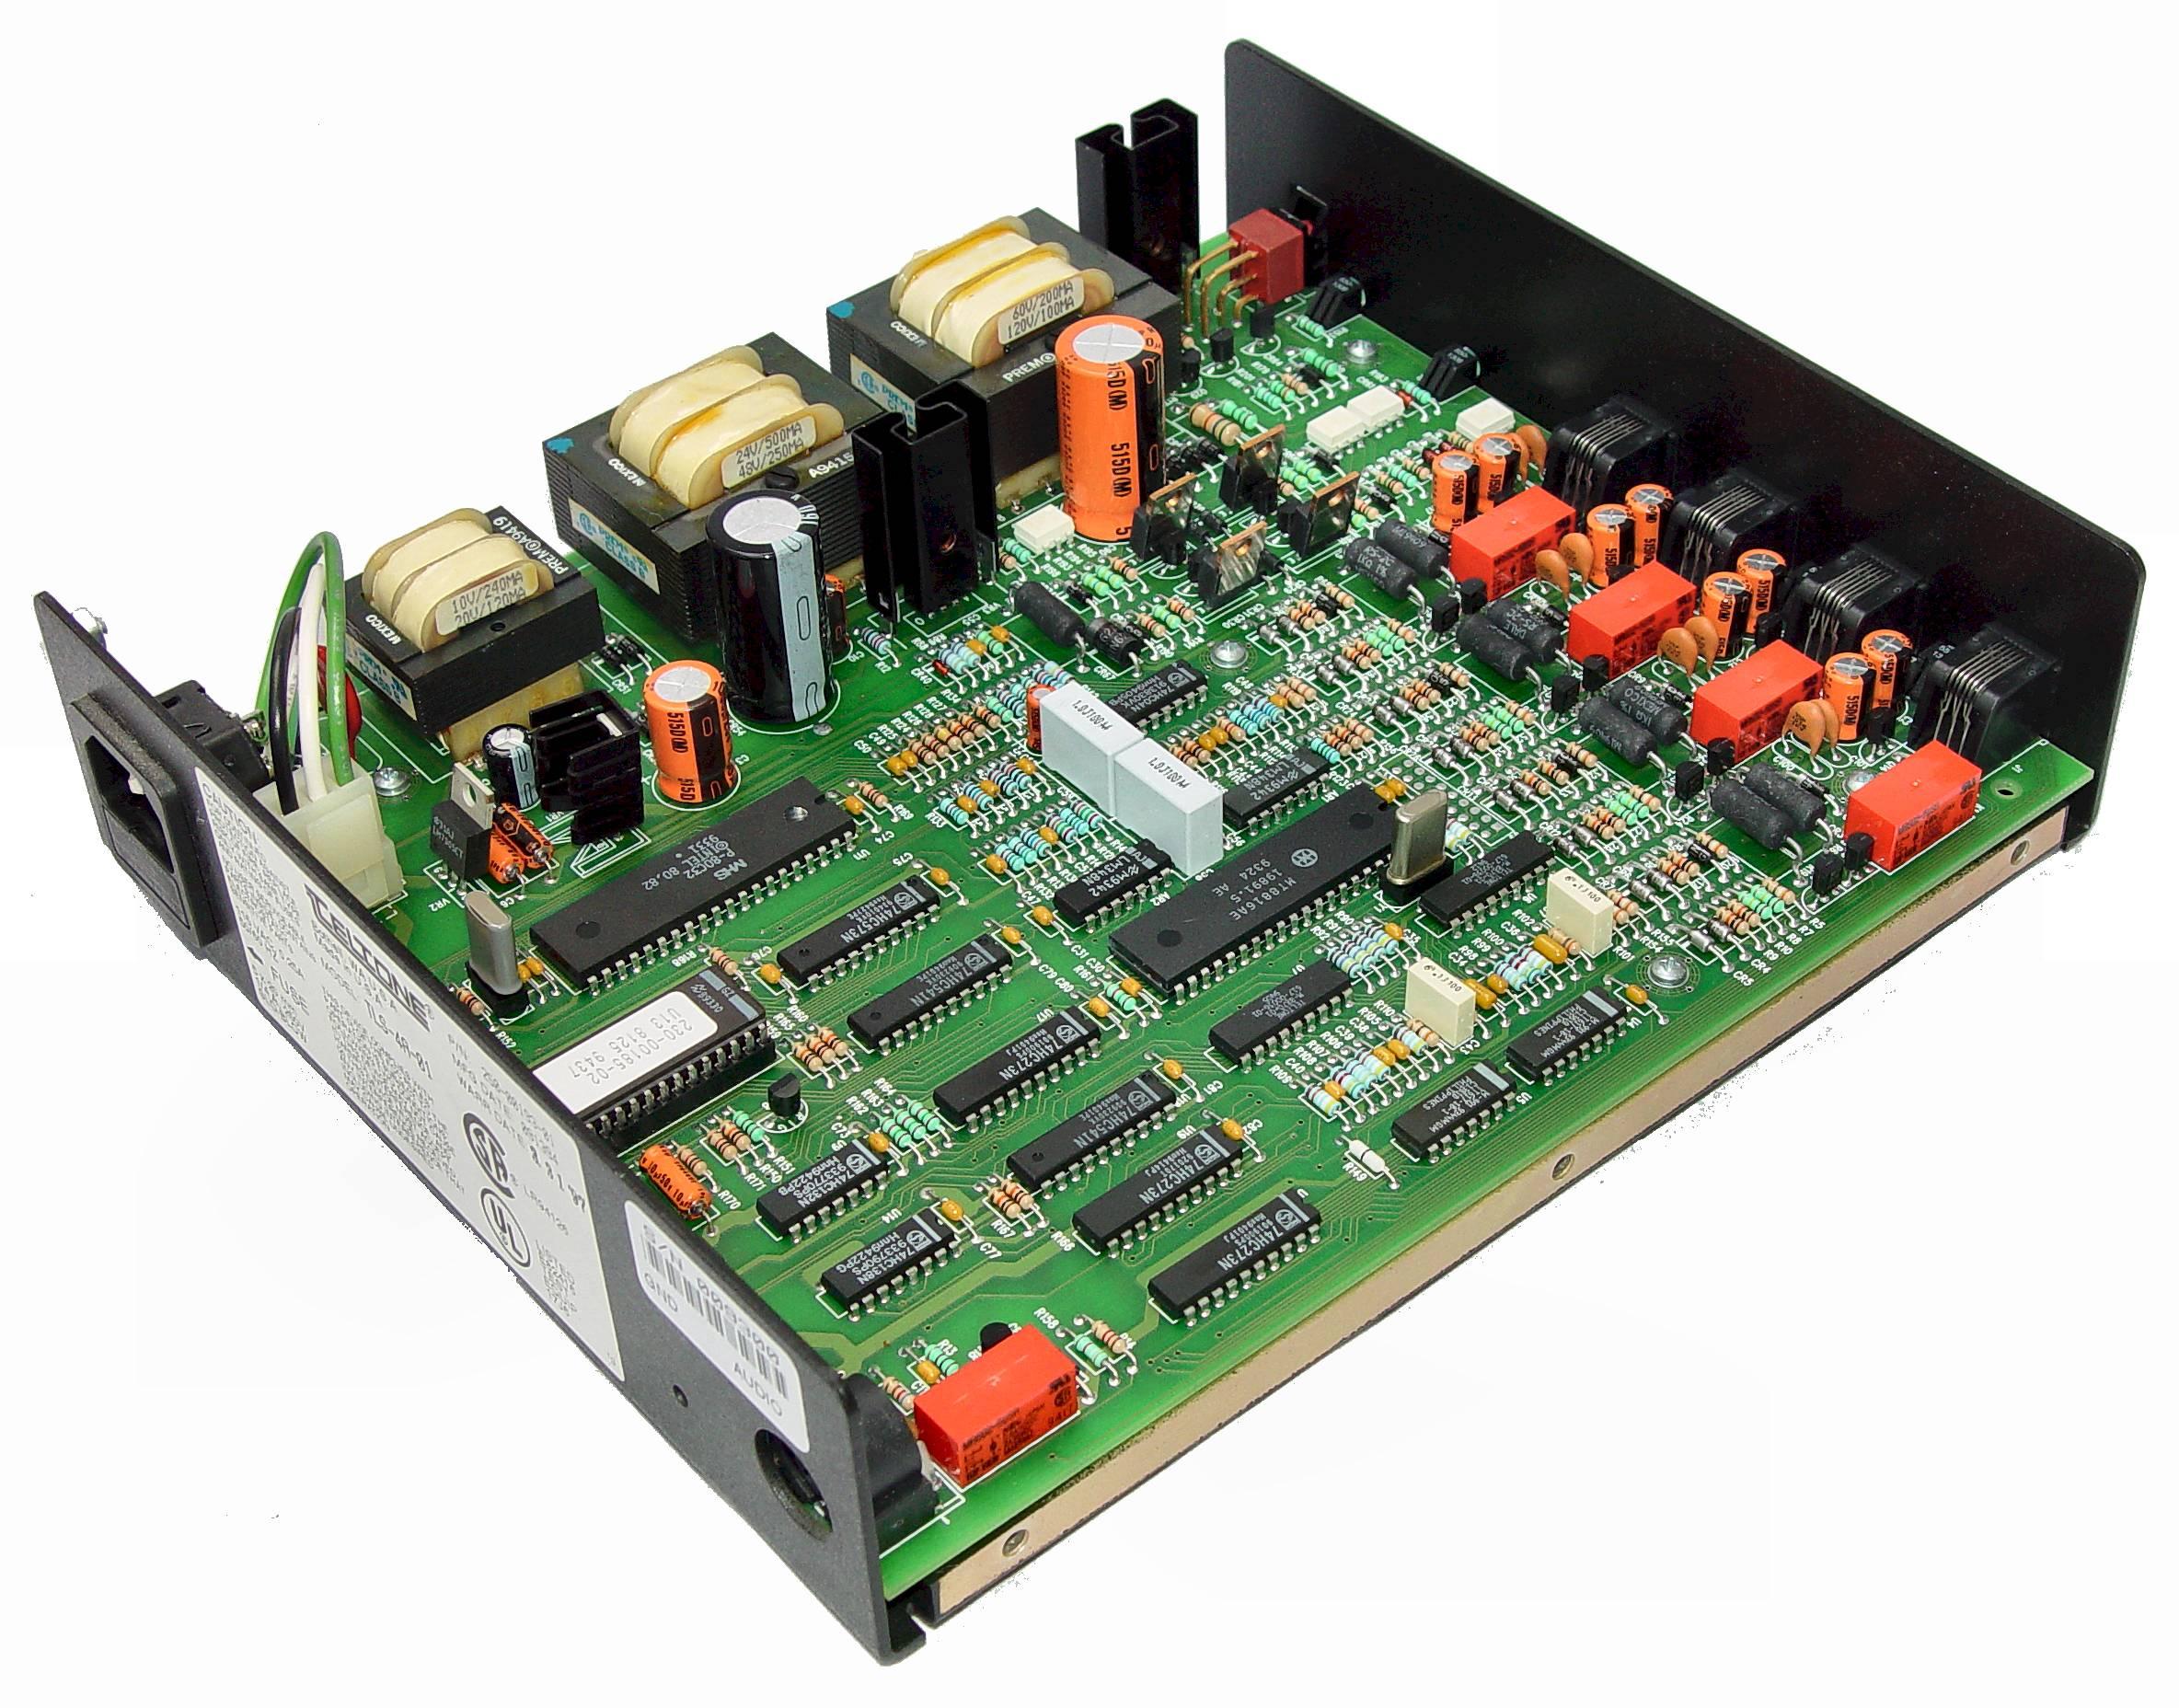 Telephone Line Simulator Circuit Music On Hold Angle Shot Of Insides Camera